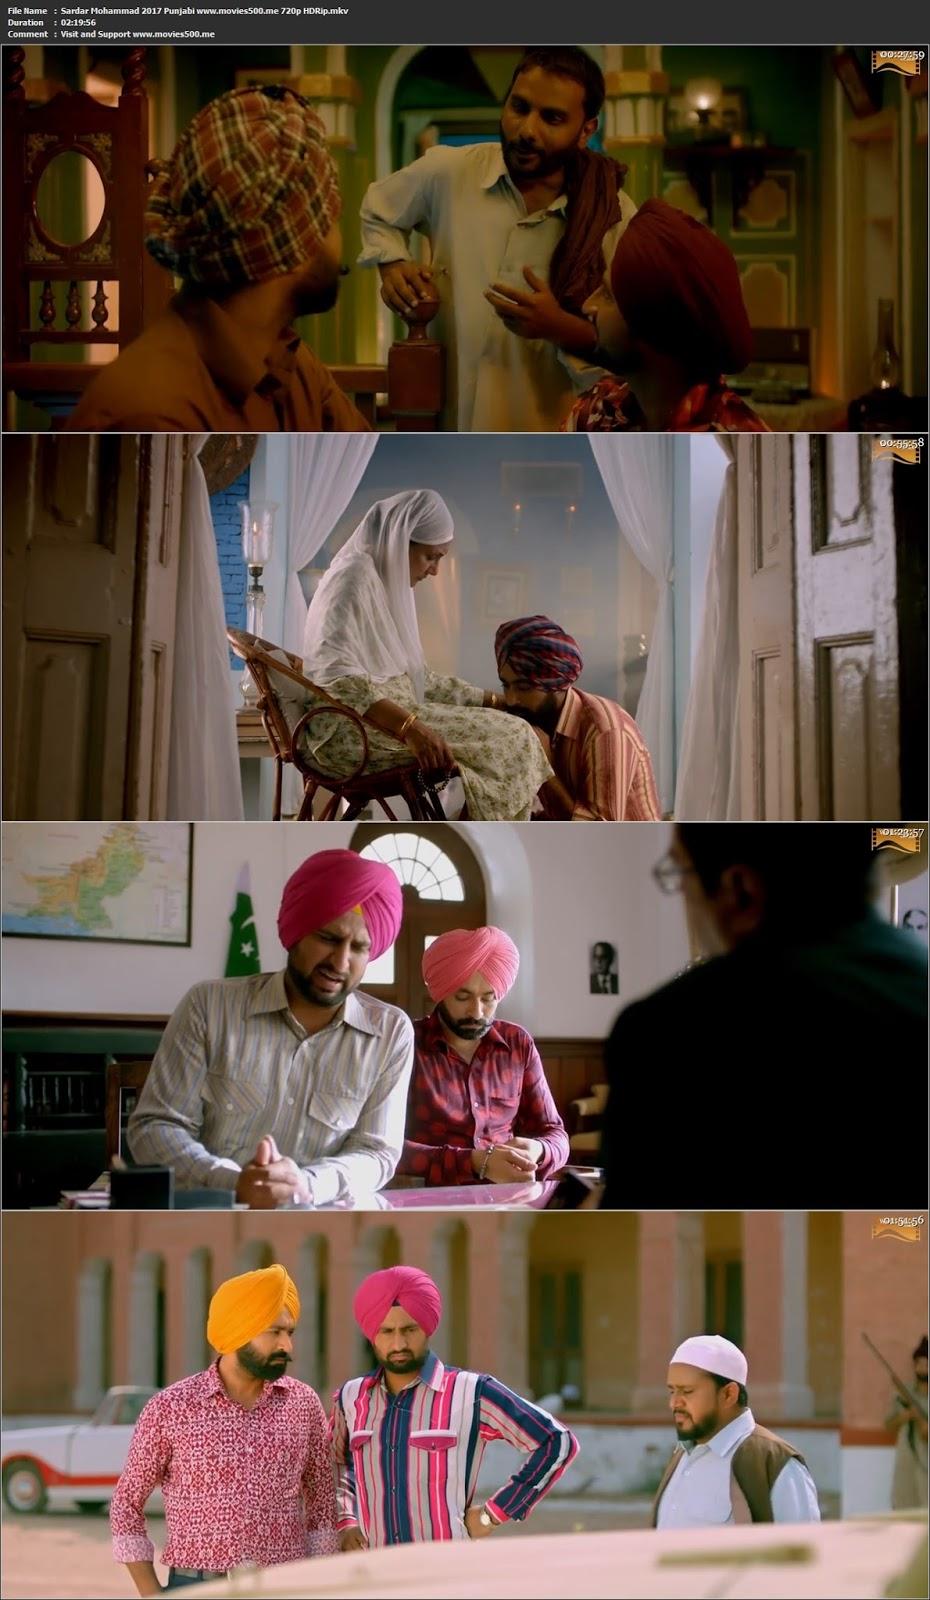 Sardar Mohammad 2017 Punjabi Full Movie HDRip 720p at sidsays.org.uk